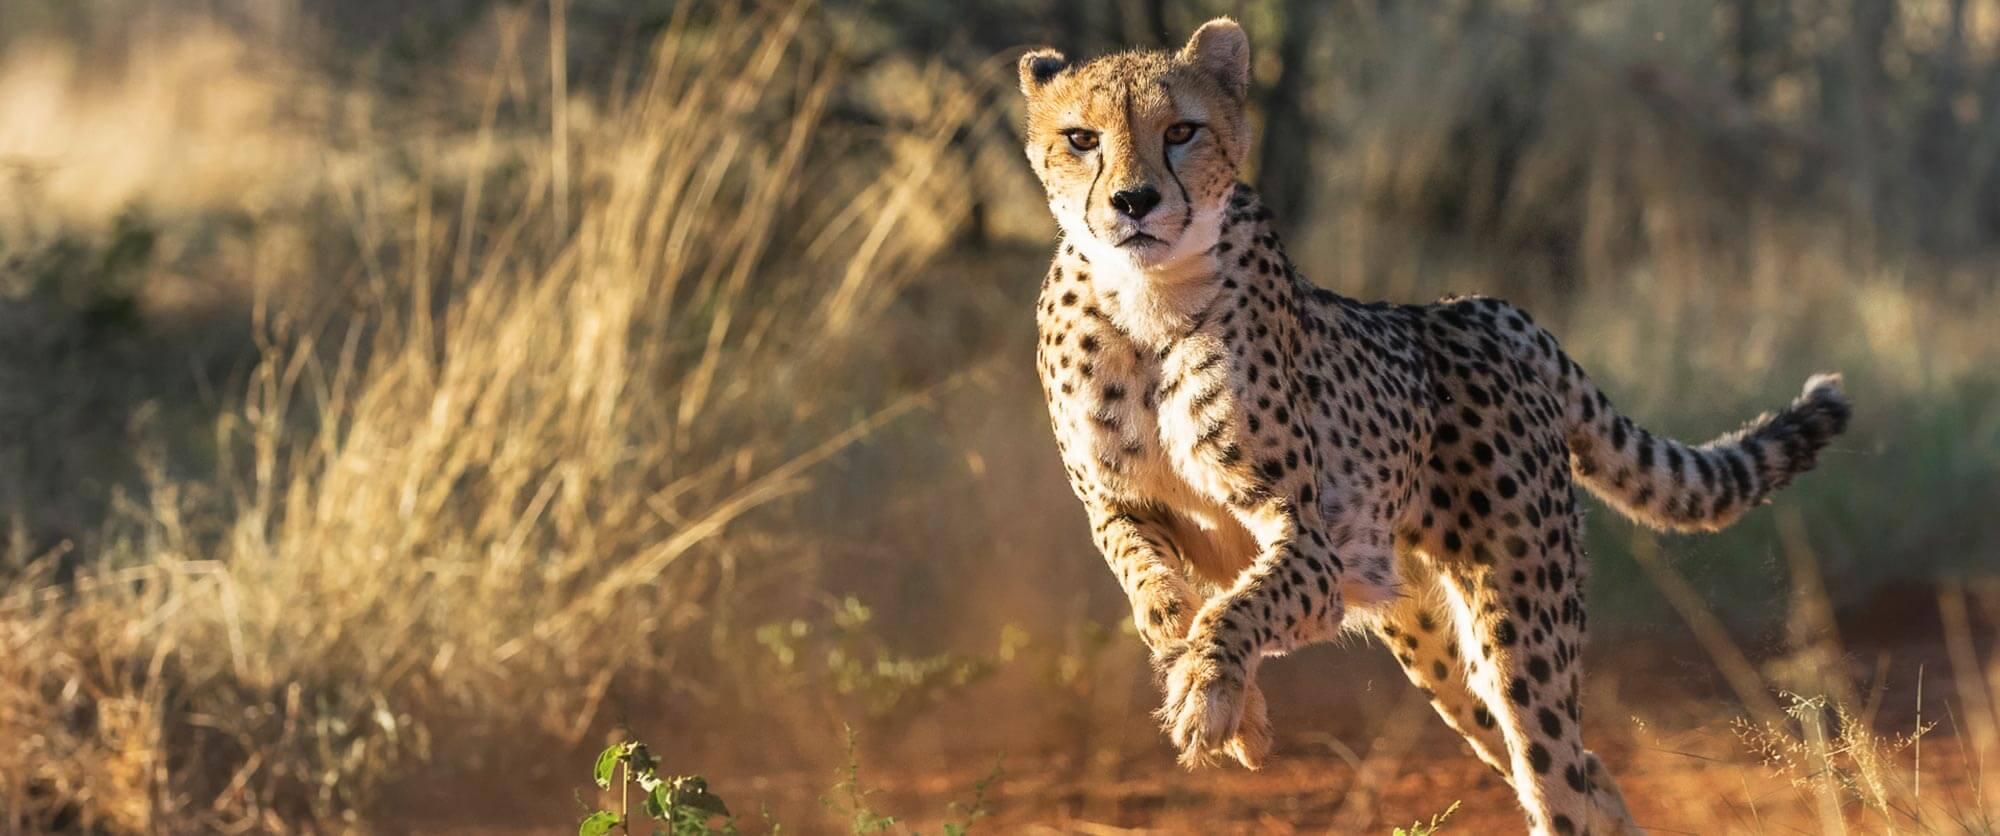 Cheetah at Okonjima Nature Reserve, Namibia - AfriCat Foundation - Namibia Safari